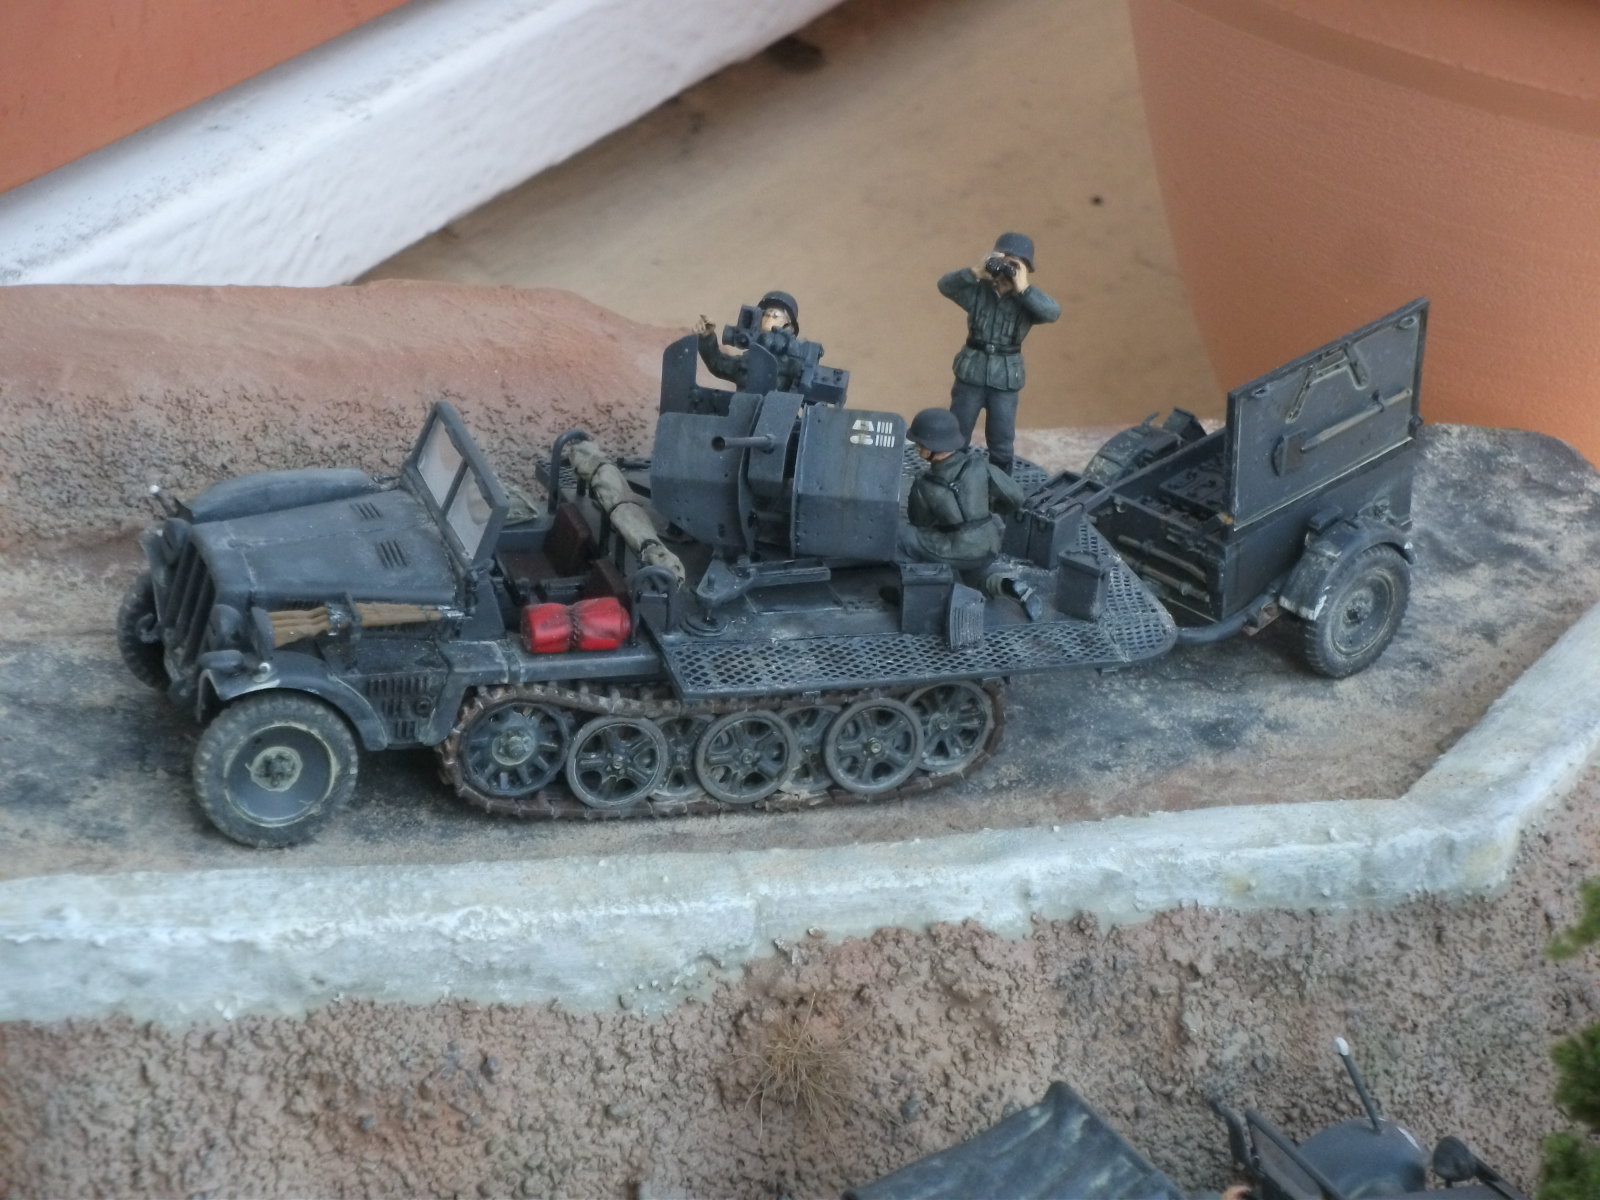 sdkfz - SdKfz 10/4, Krupp Protze et fieldkitchen au 1/48 DSCF1123